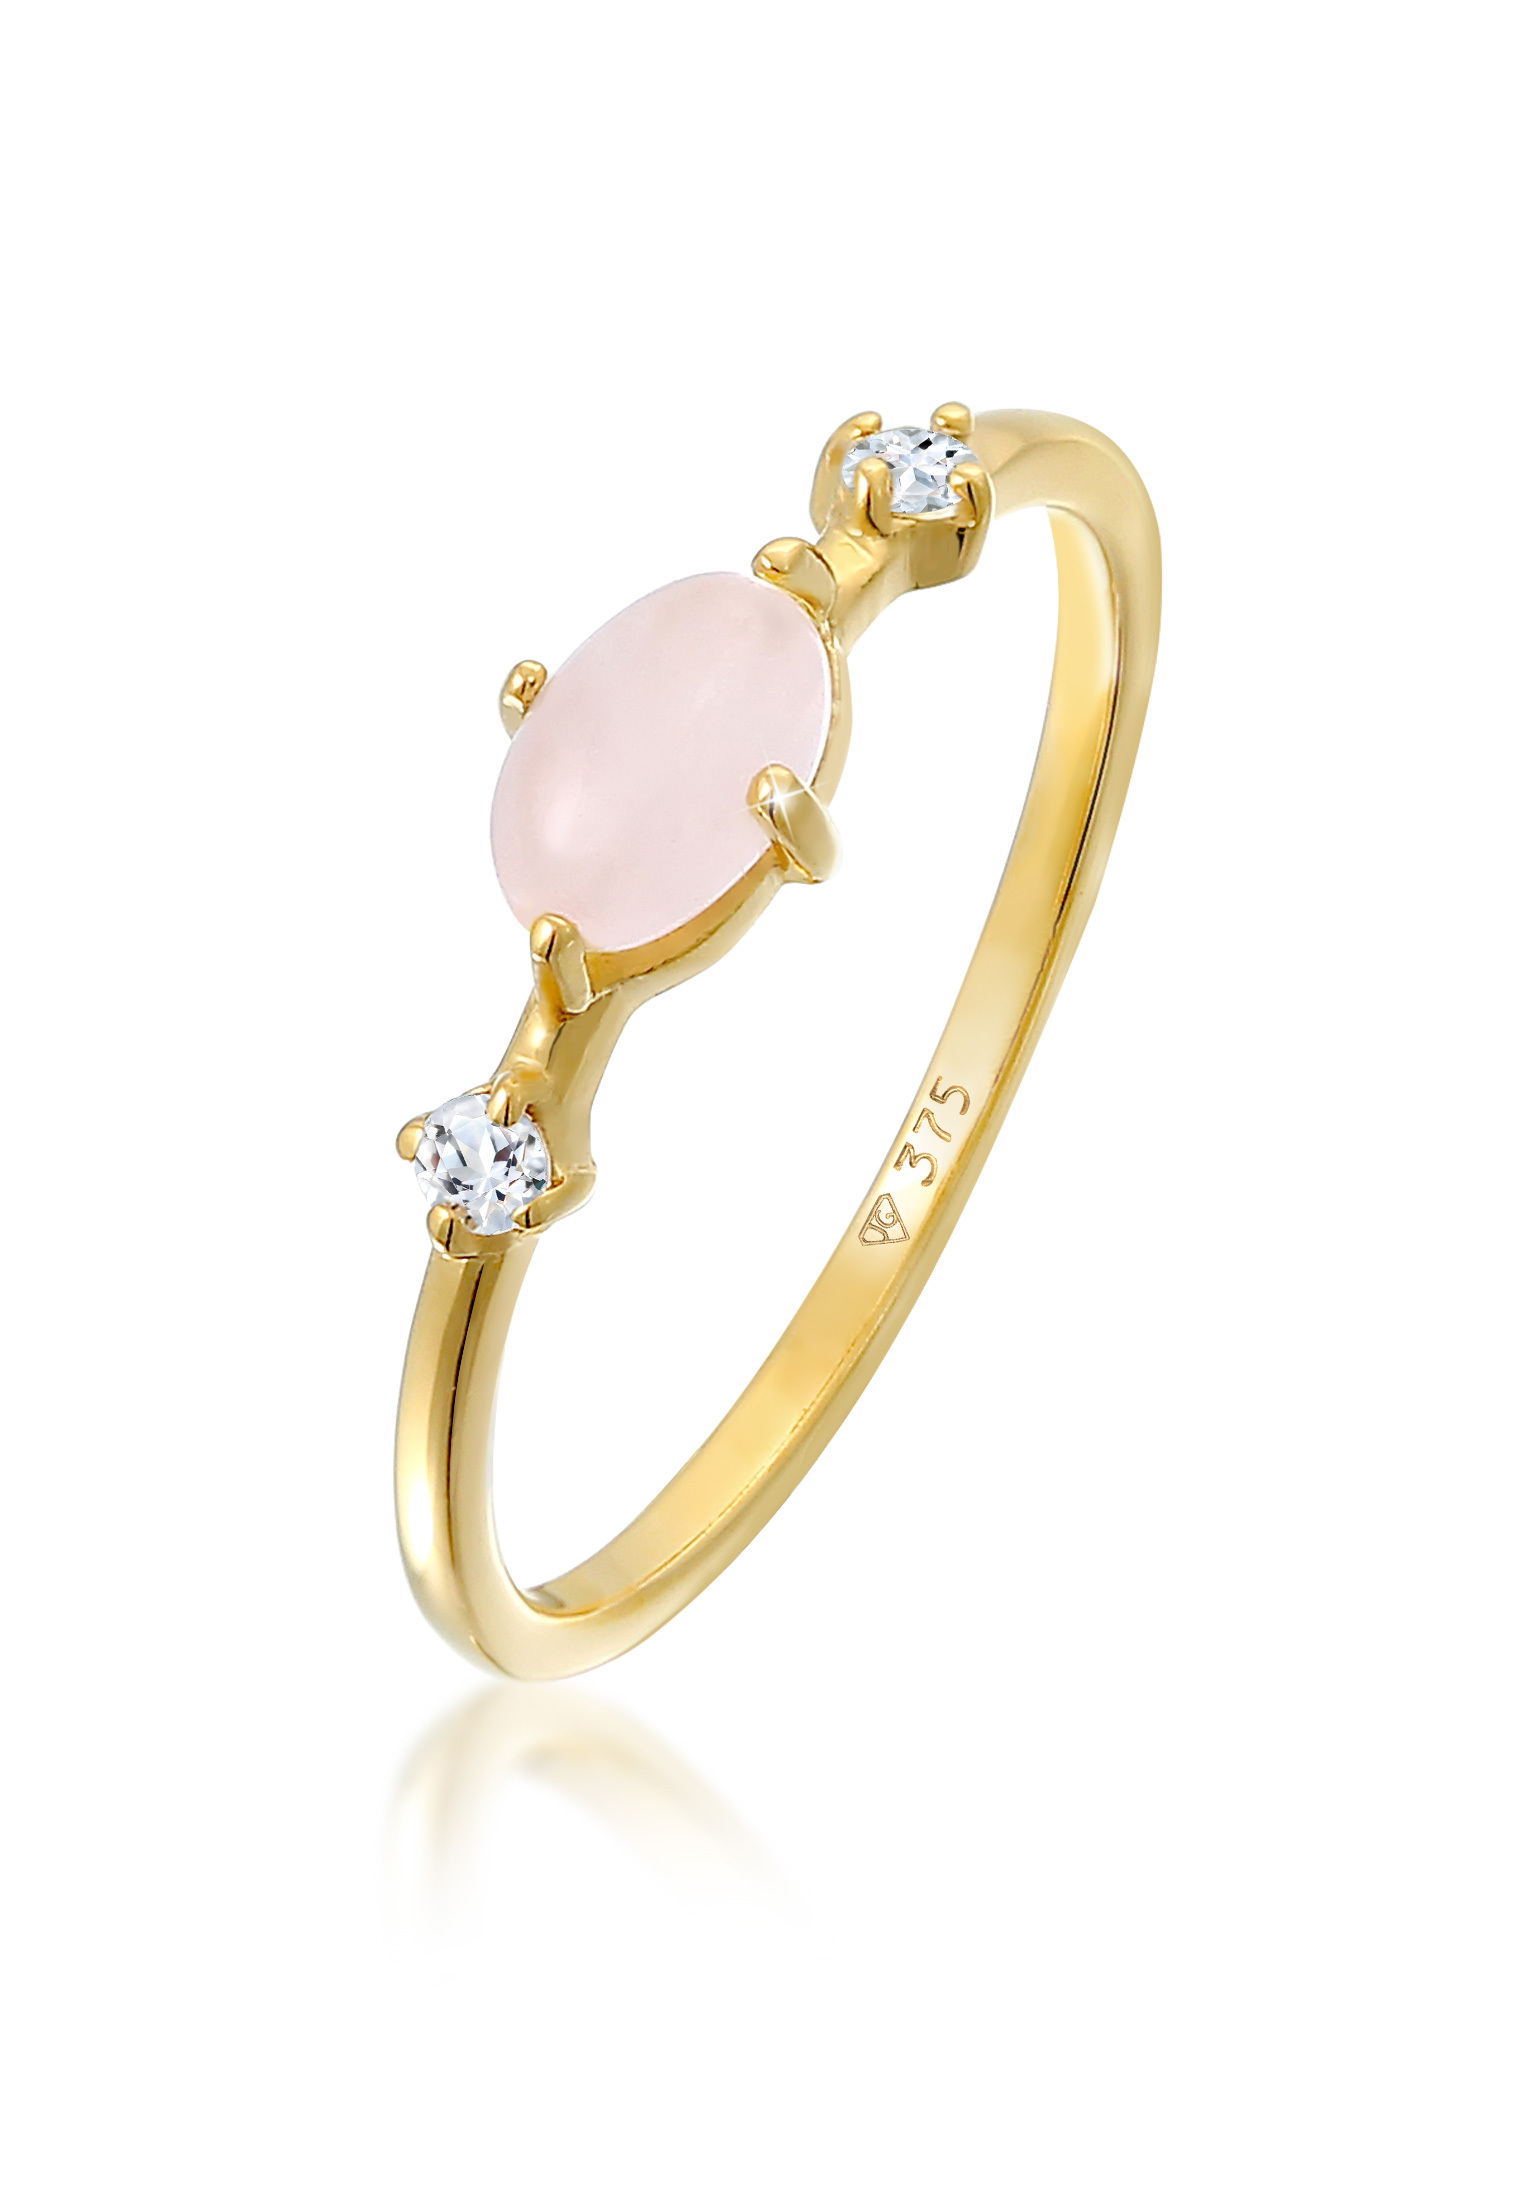 Ring | Quartz (rosa), Topas (weiß) | 375er Gelbgold